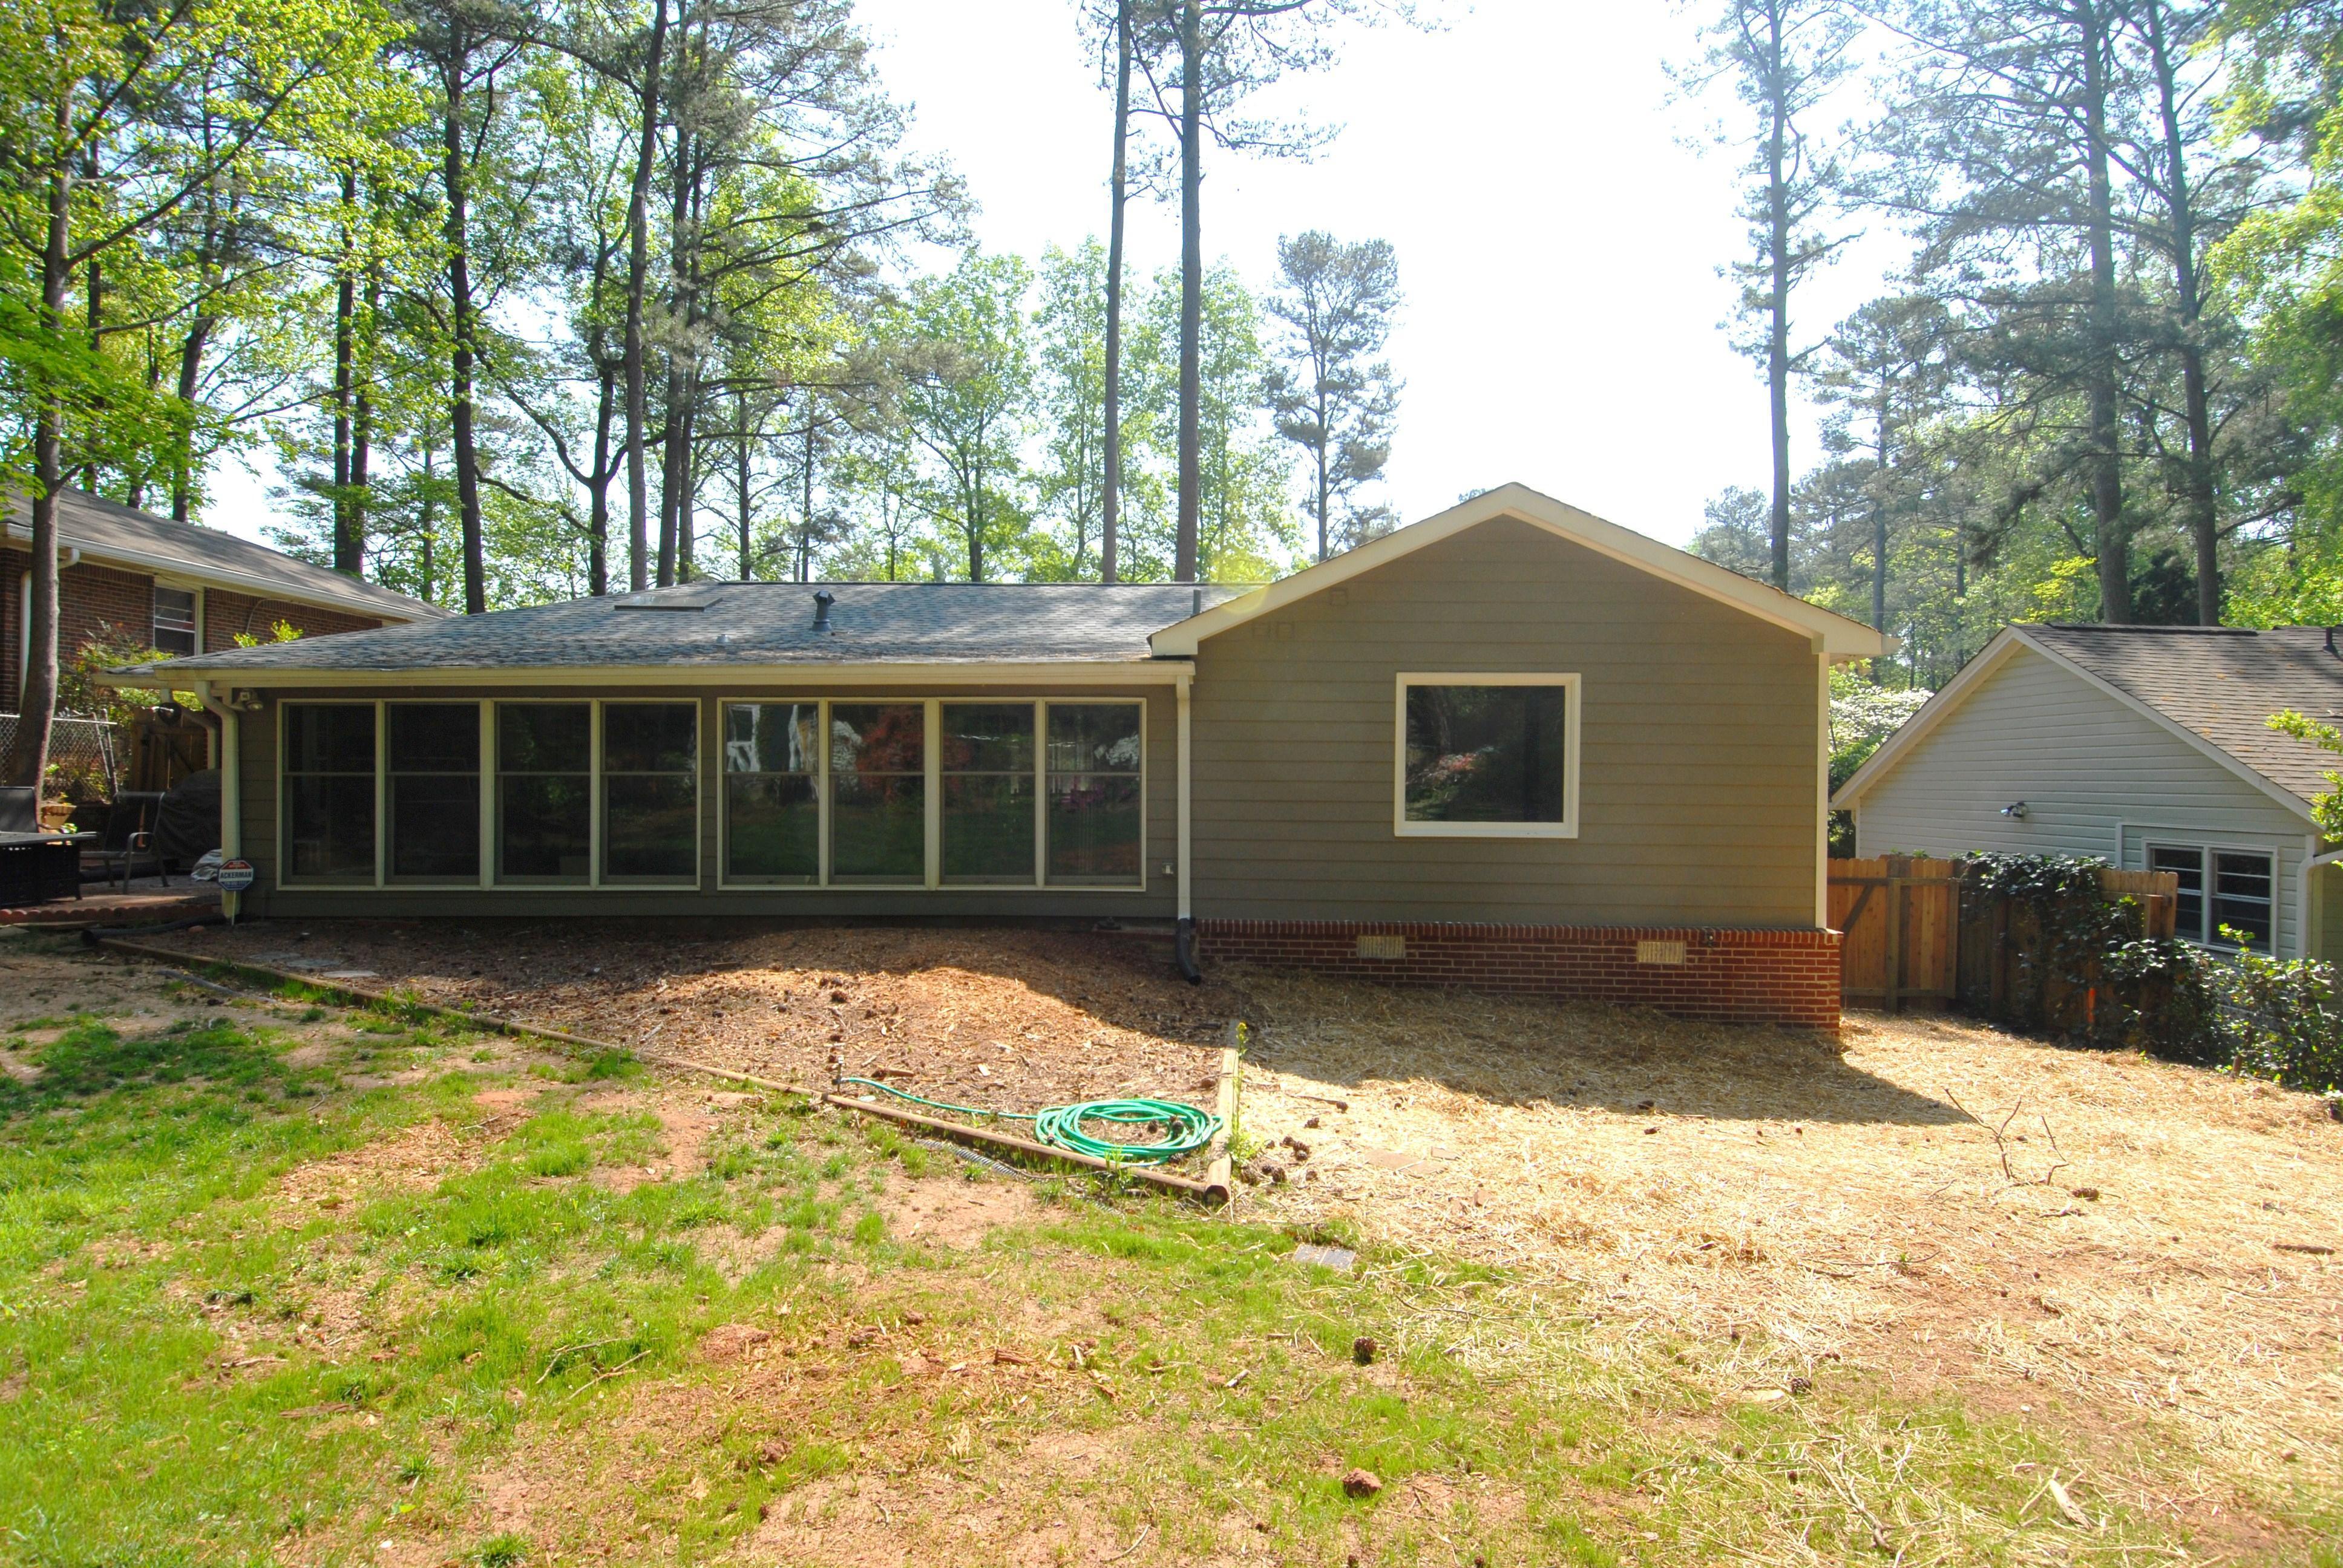 Mgm custom homes remodeling llc in canton ga 30115 for Custom home builders canton ga